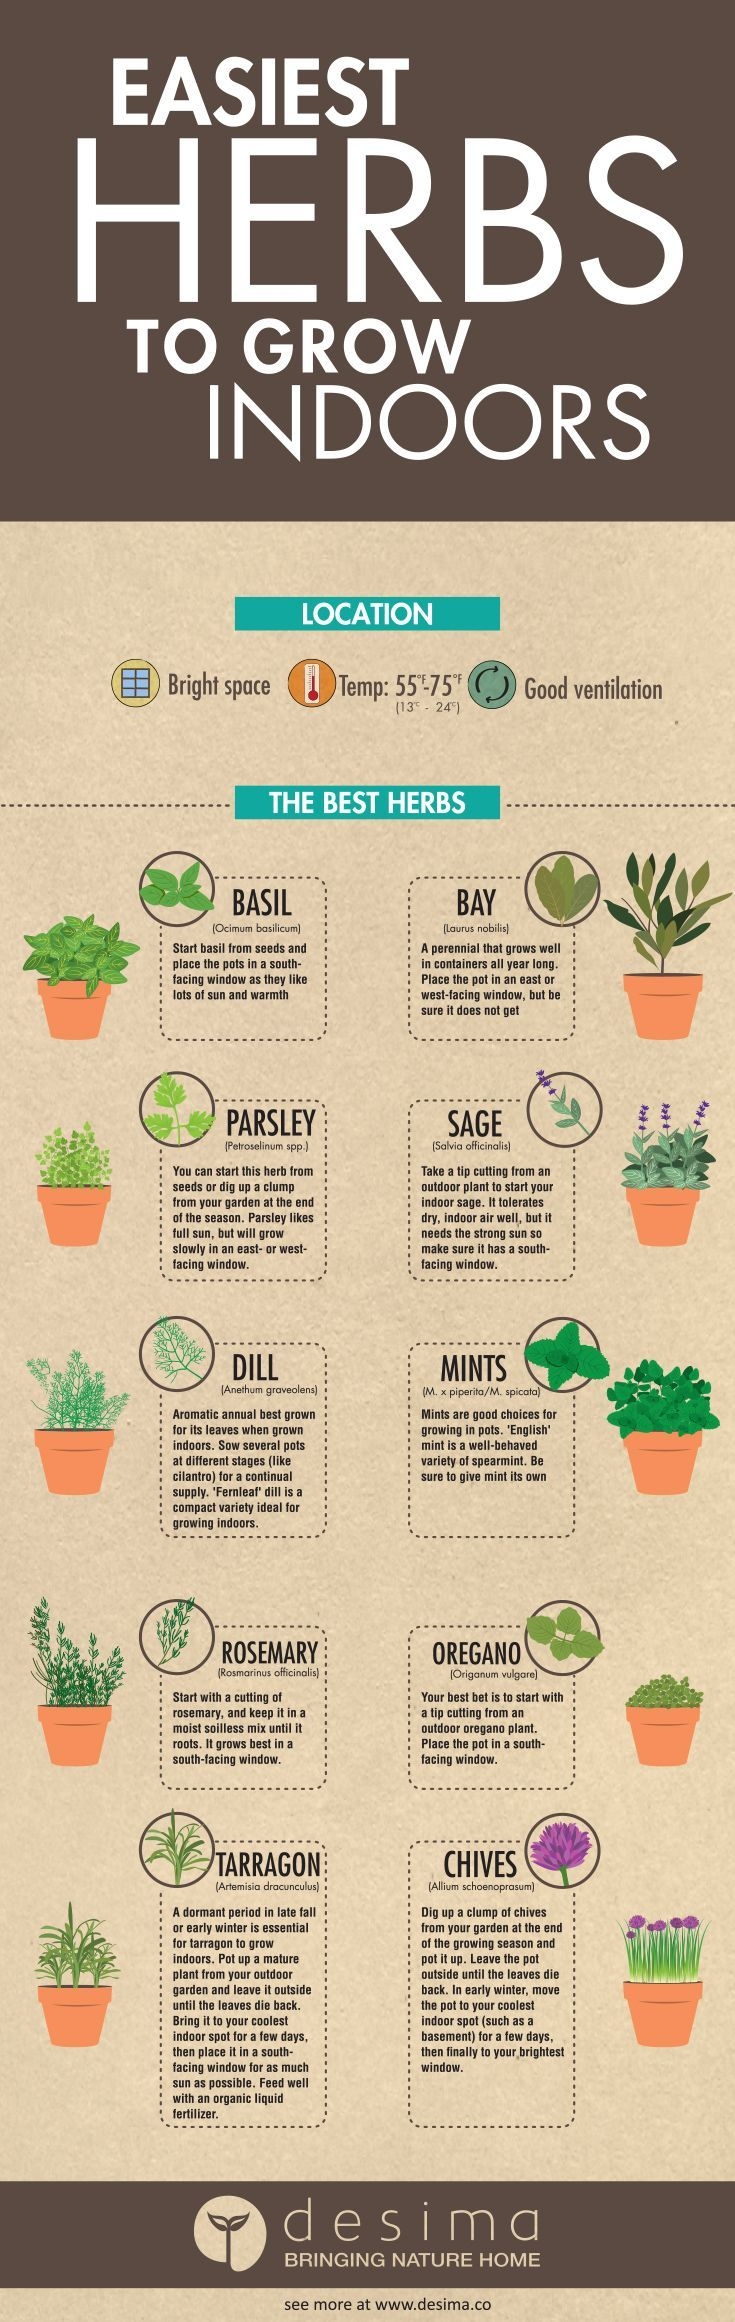 Easiest Herbs to Grow Indoors                                                                                                                                                                                 More